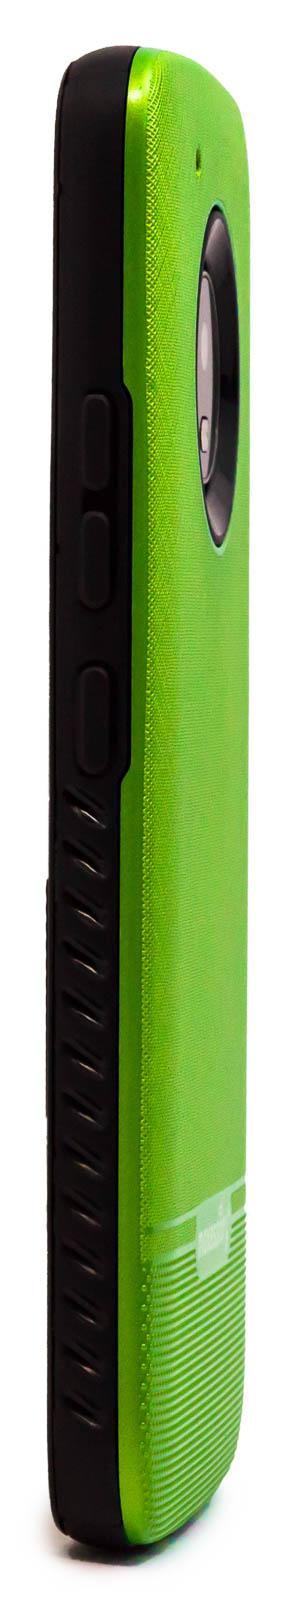 Moto-G5-Plus-Case-Moto-X-17-Case-Ultra-Thin-Hard-Body-Tactile-Shell-Cover thumbnail 18